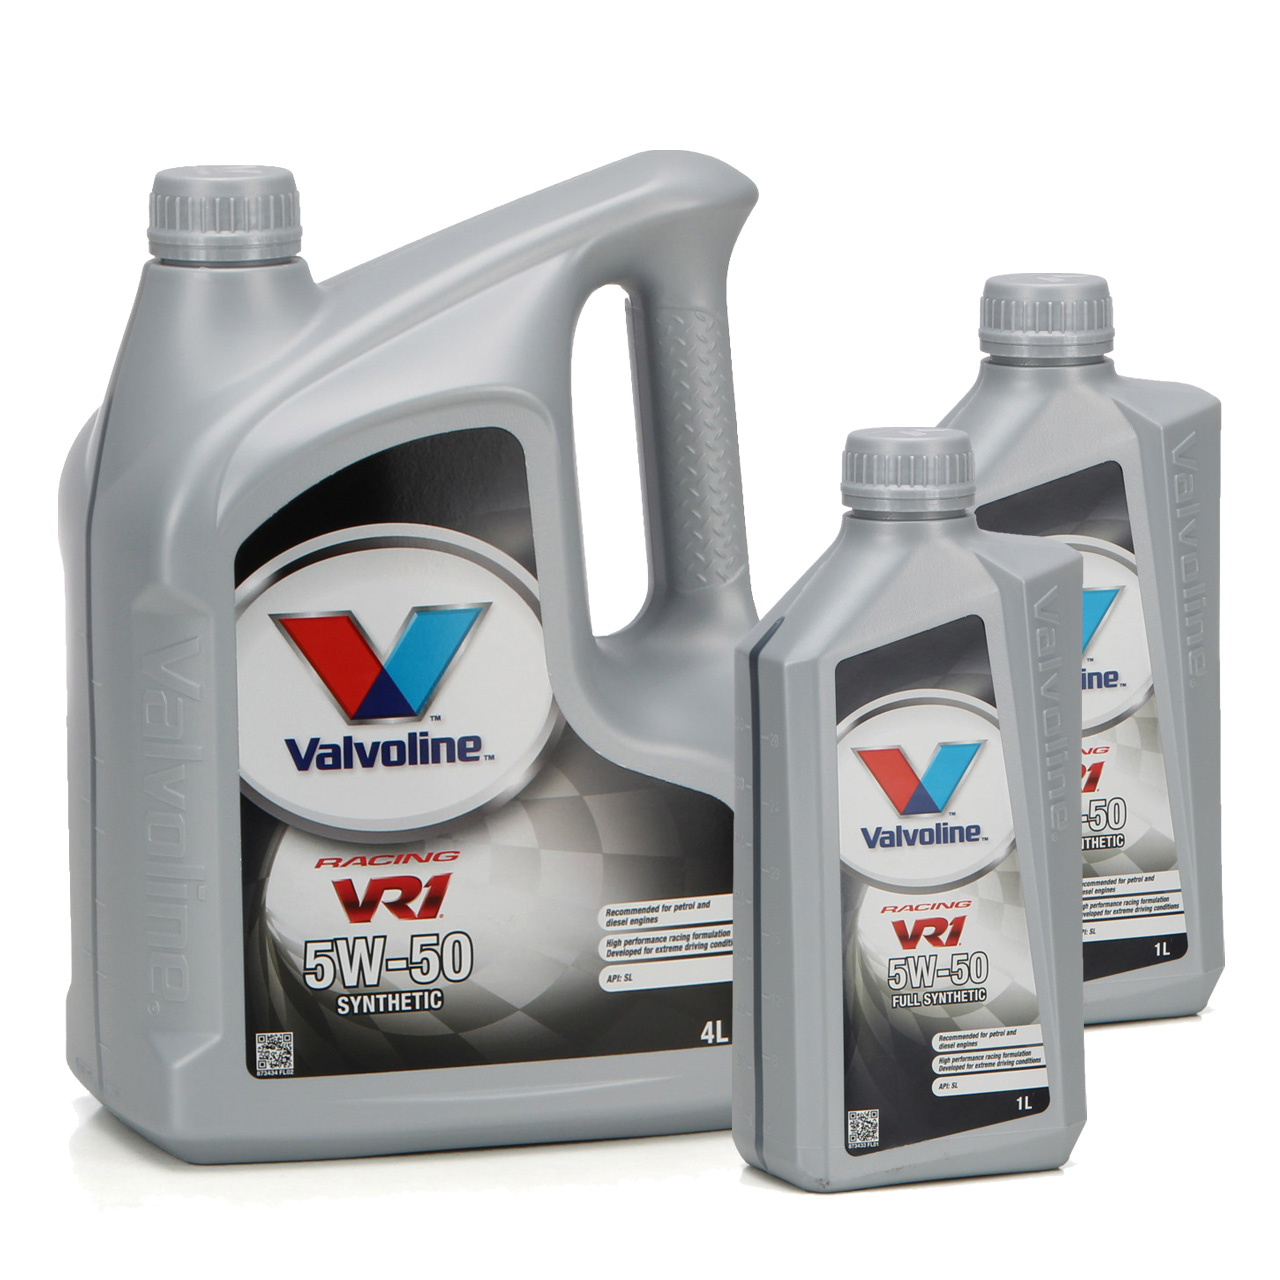 VALVOLINE Motoröl ÖL VR1 RACING 5W50 SM A3/B4 Ford M2C-153E GM 6094M - 6 Liter